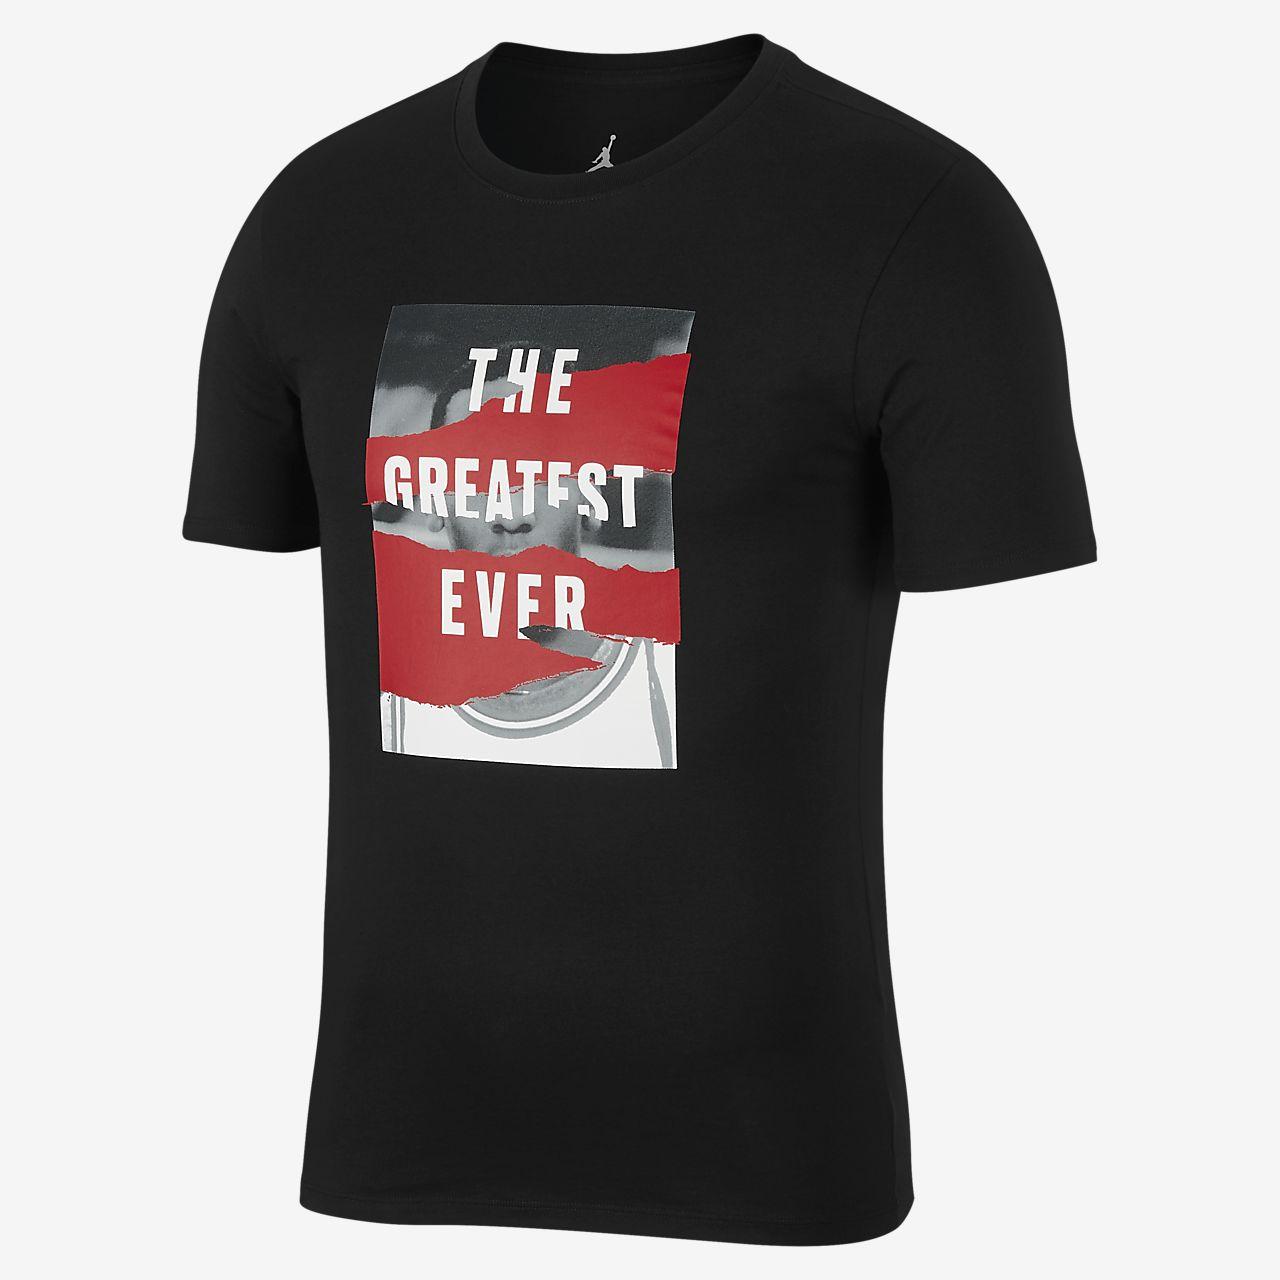 0838bbd5c52198 Jordan Sportswear Heritage Men s Graphic T-Shirt. Nike.com IN